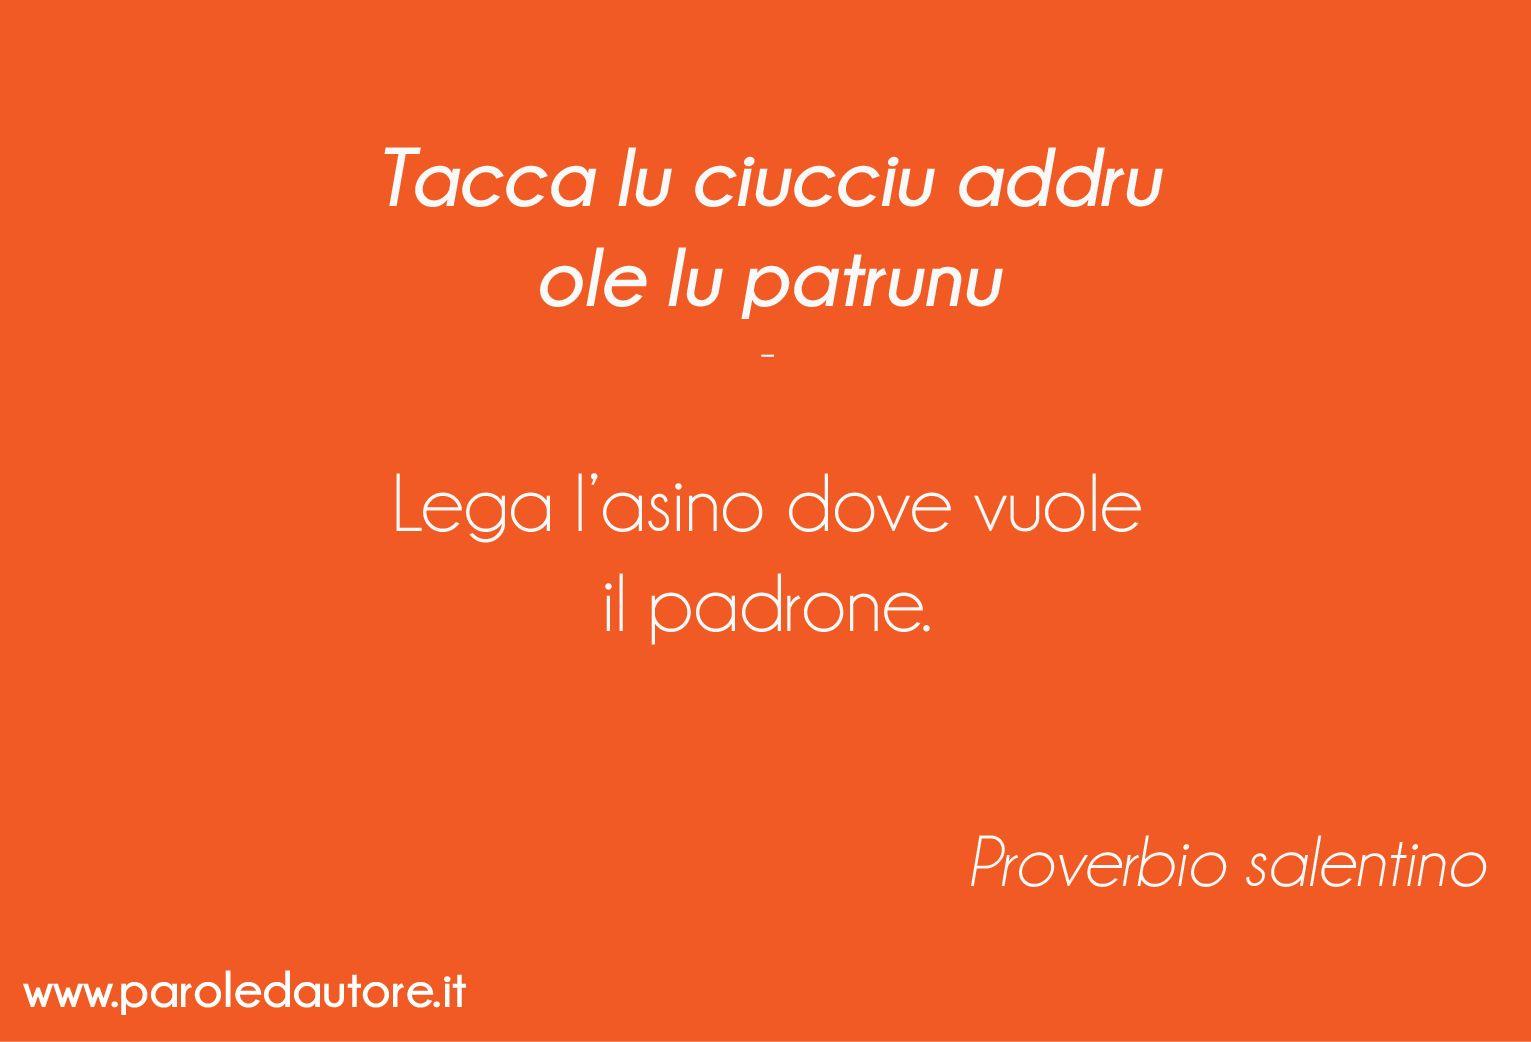 super popular 70702 fcb05 Tacca lu ciucciu addro ole lu patrunu. #Salento #Proverbi ...